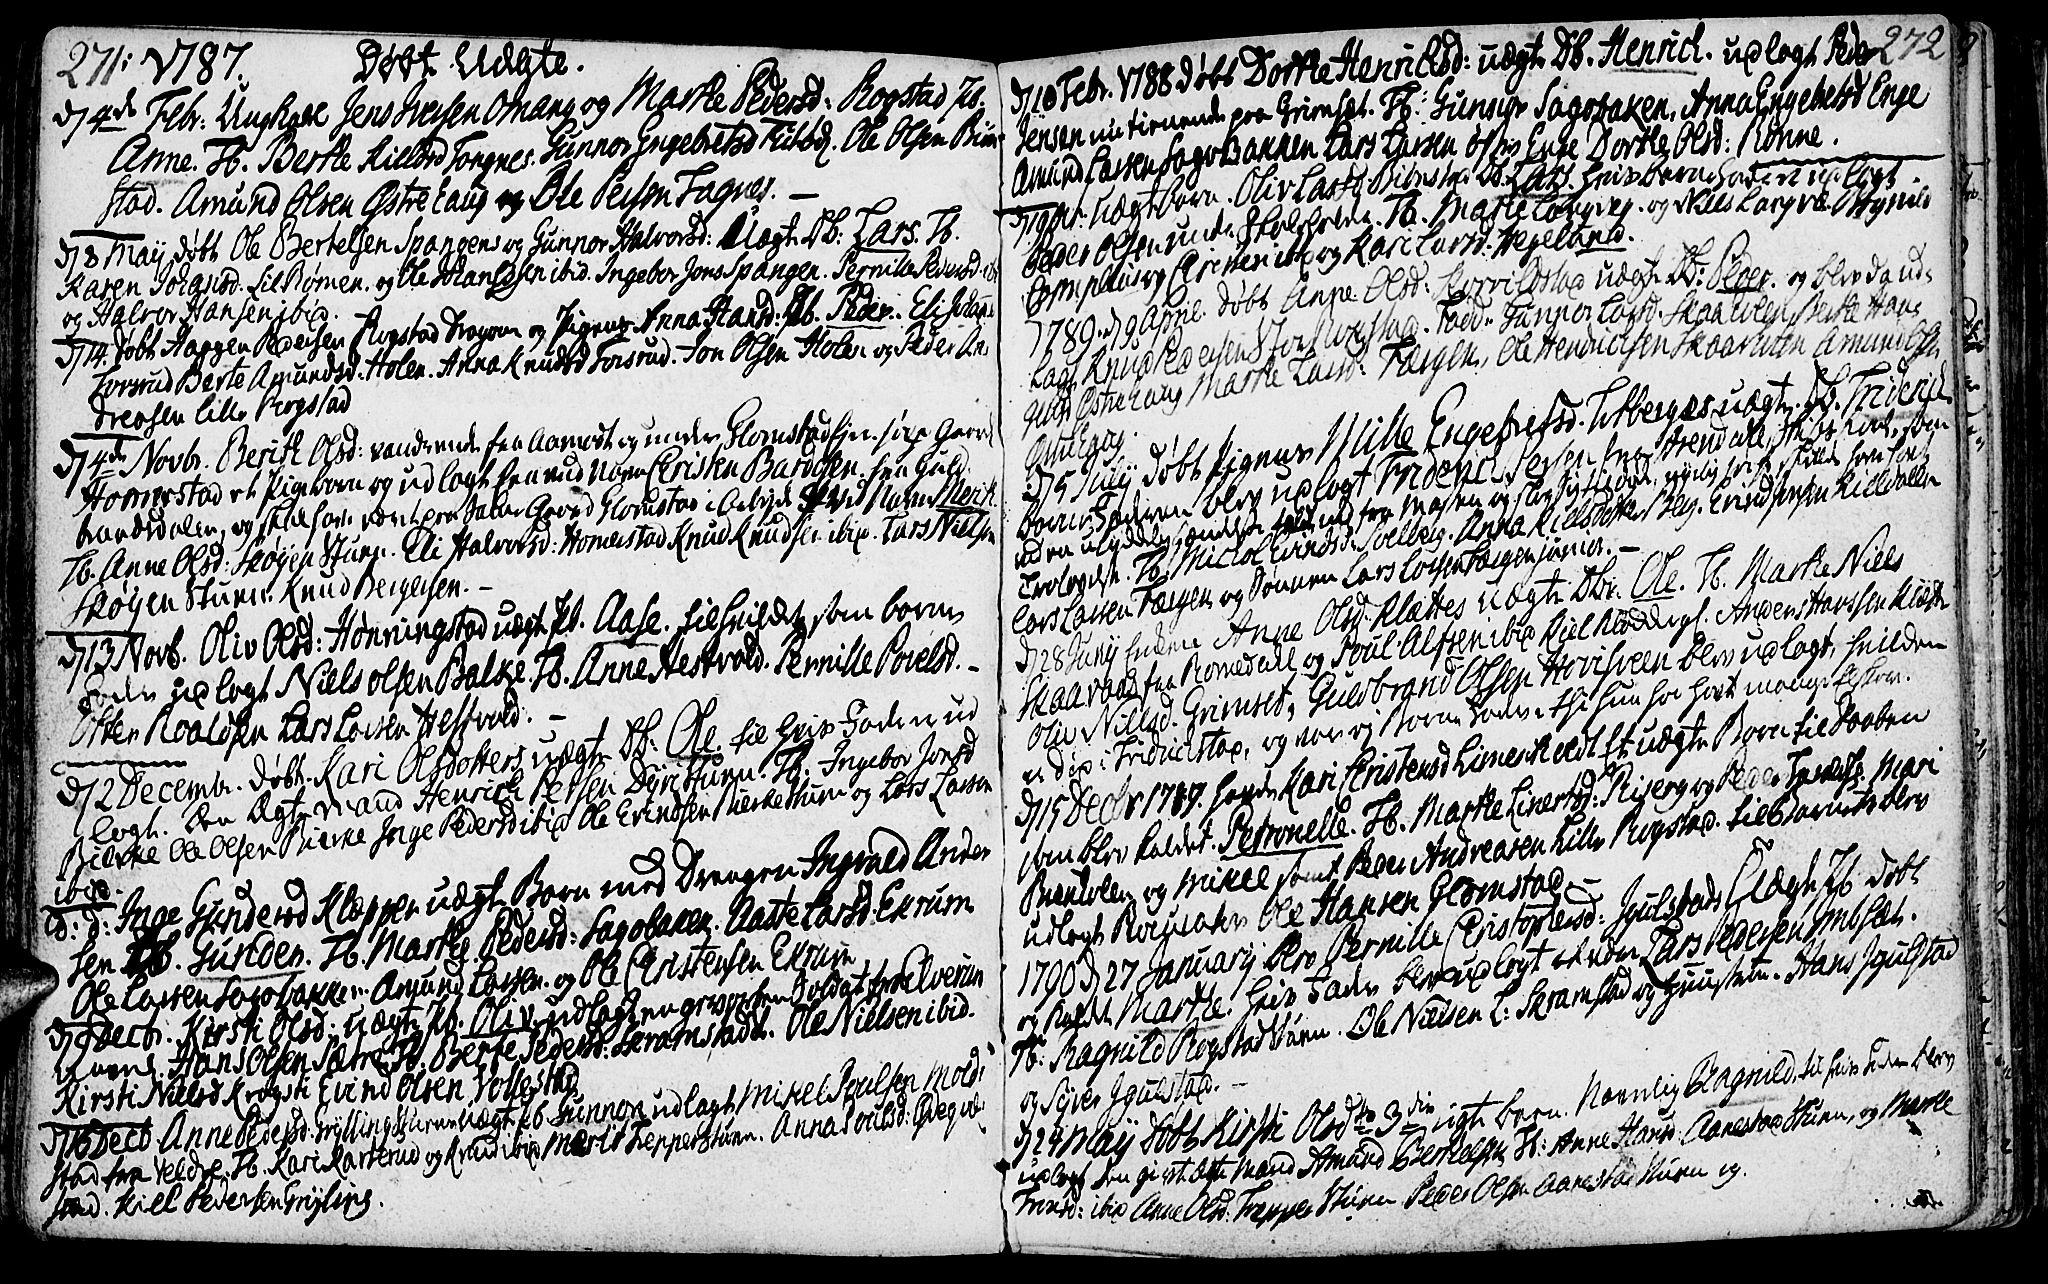 SAH, Løten prestekontor, K/Ka/L0003: Ministerialbok nr. 3, 1773-1800, s. 271-272